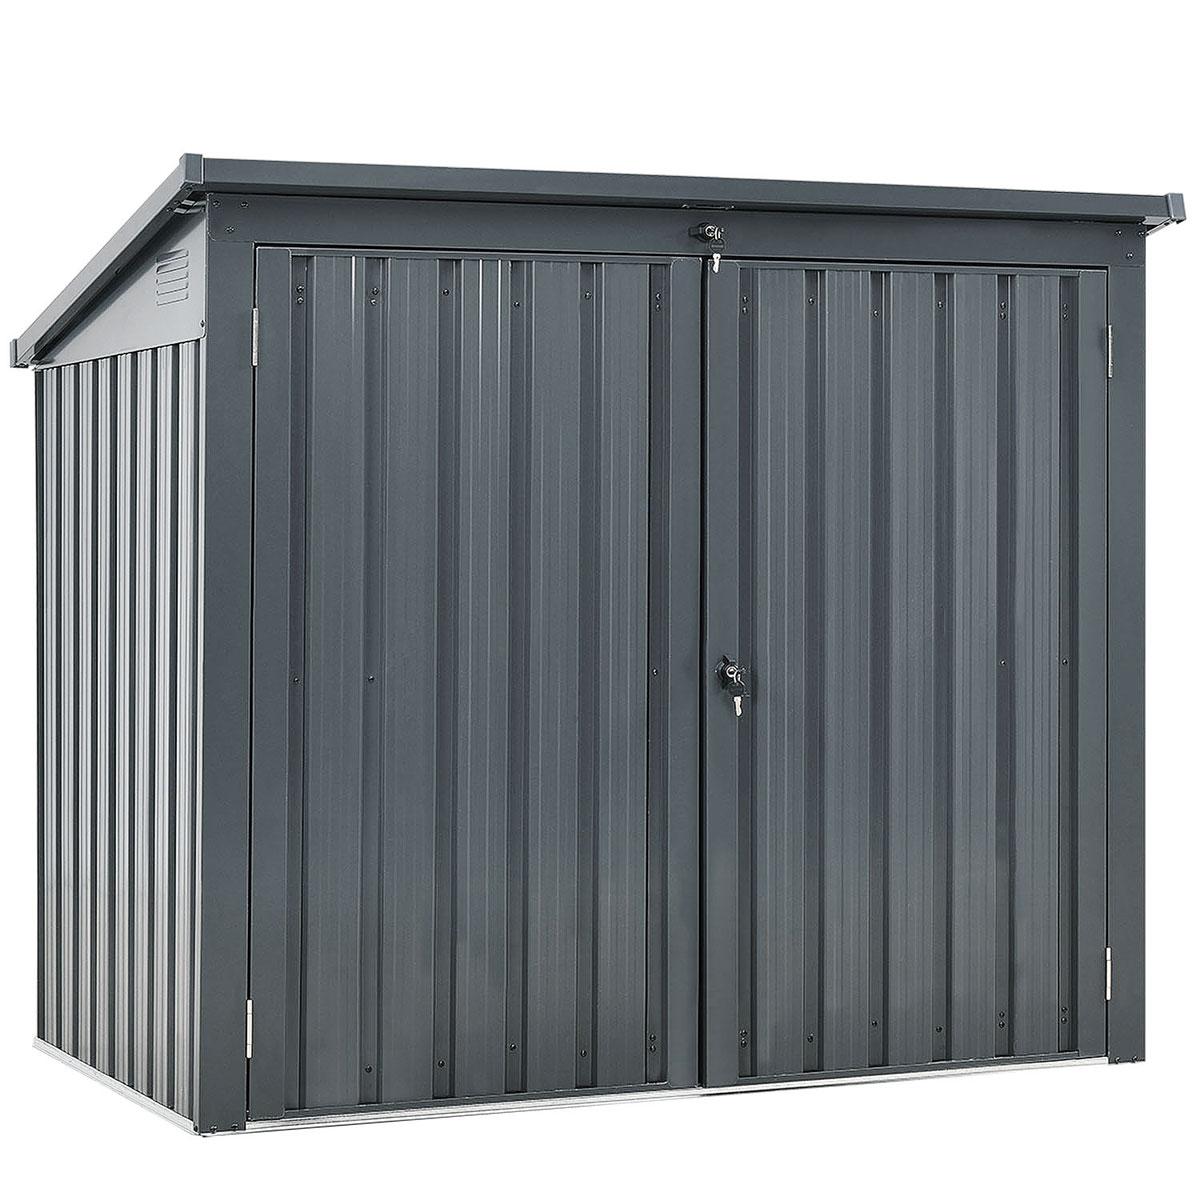 Durabil Mülltonnenbox für 2x240 L, Metall